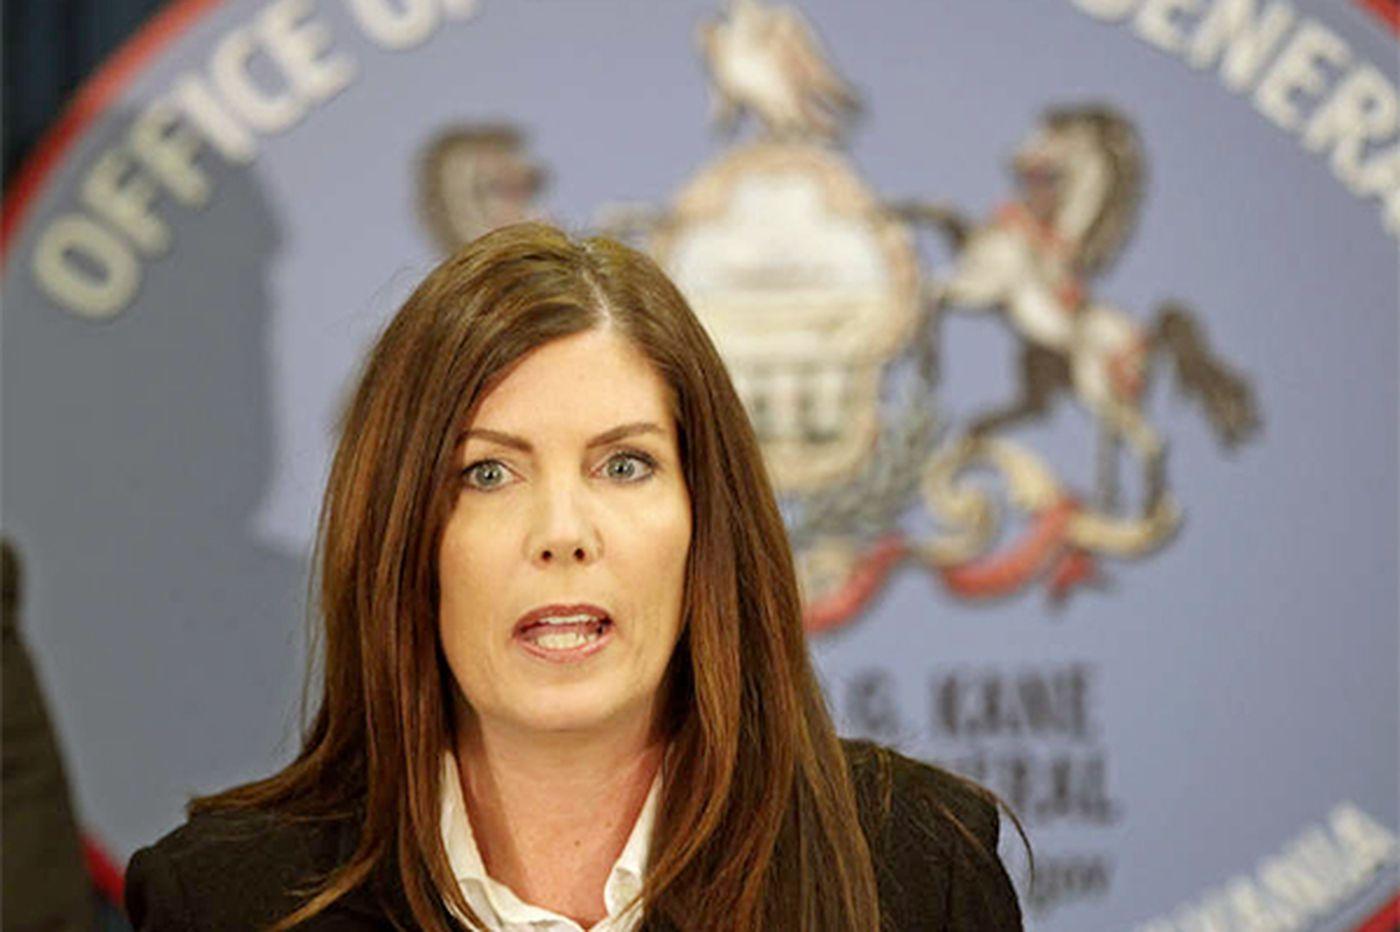 Kane reshuffles her top staff